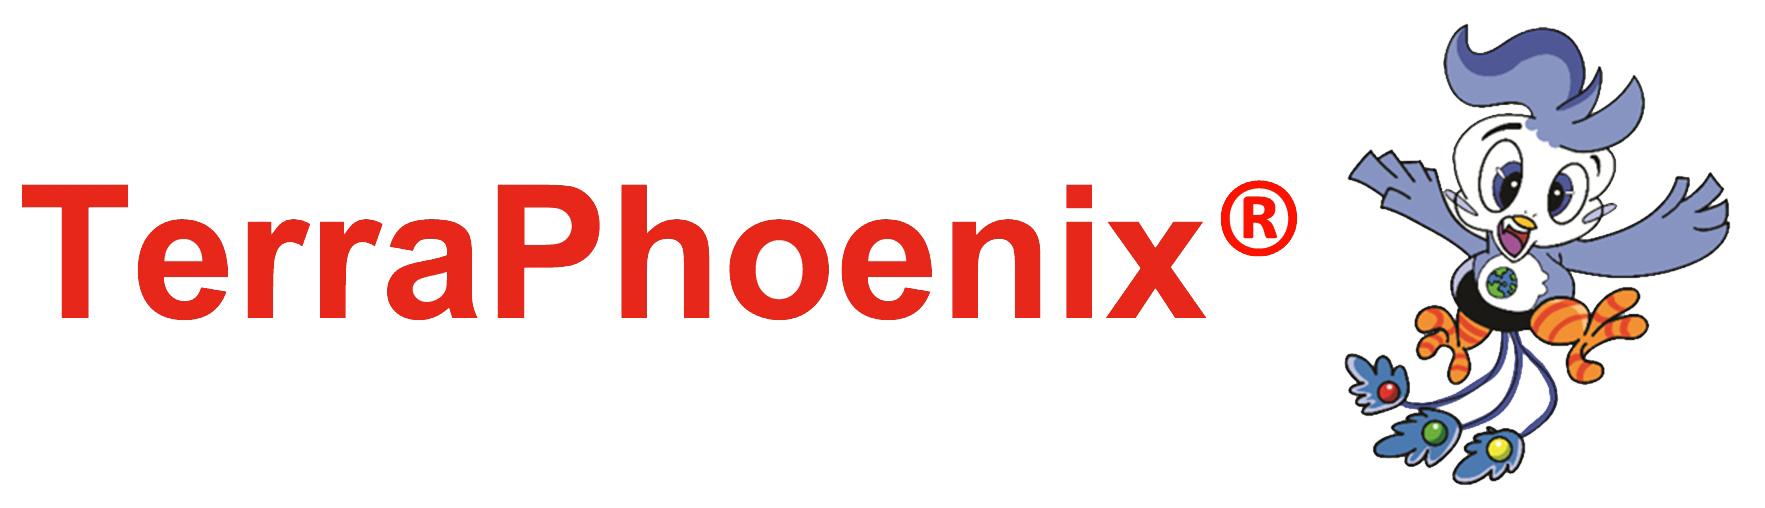 Terra Phoenix Holdings Sdn Bhd